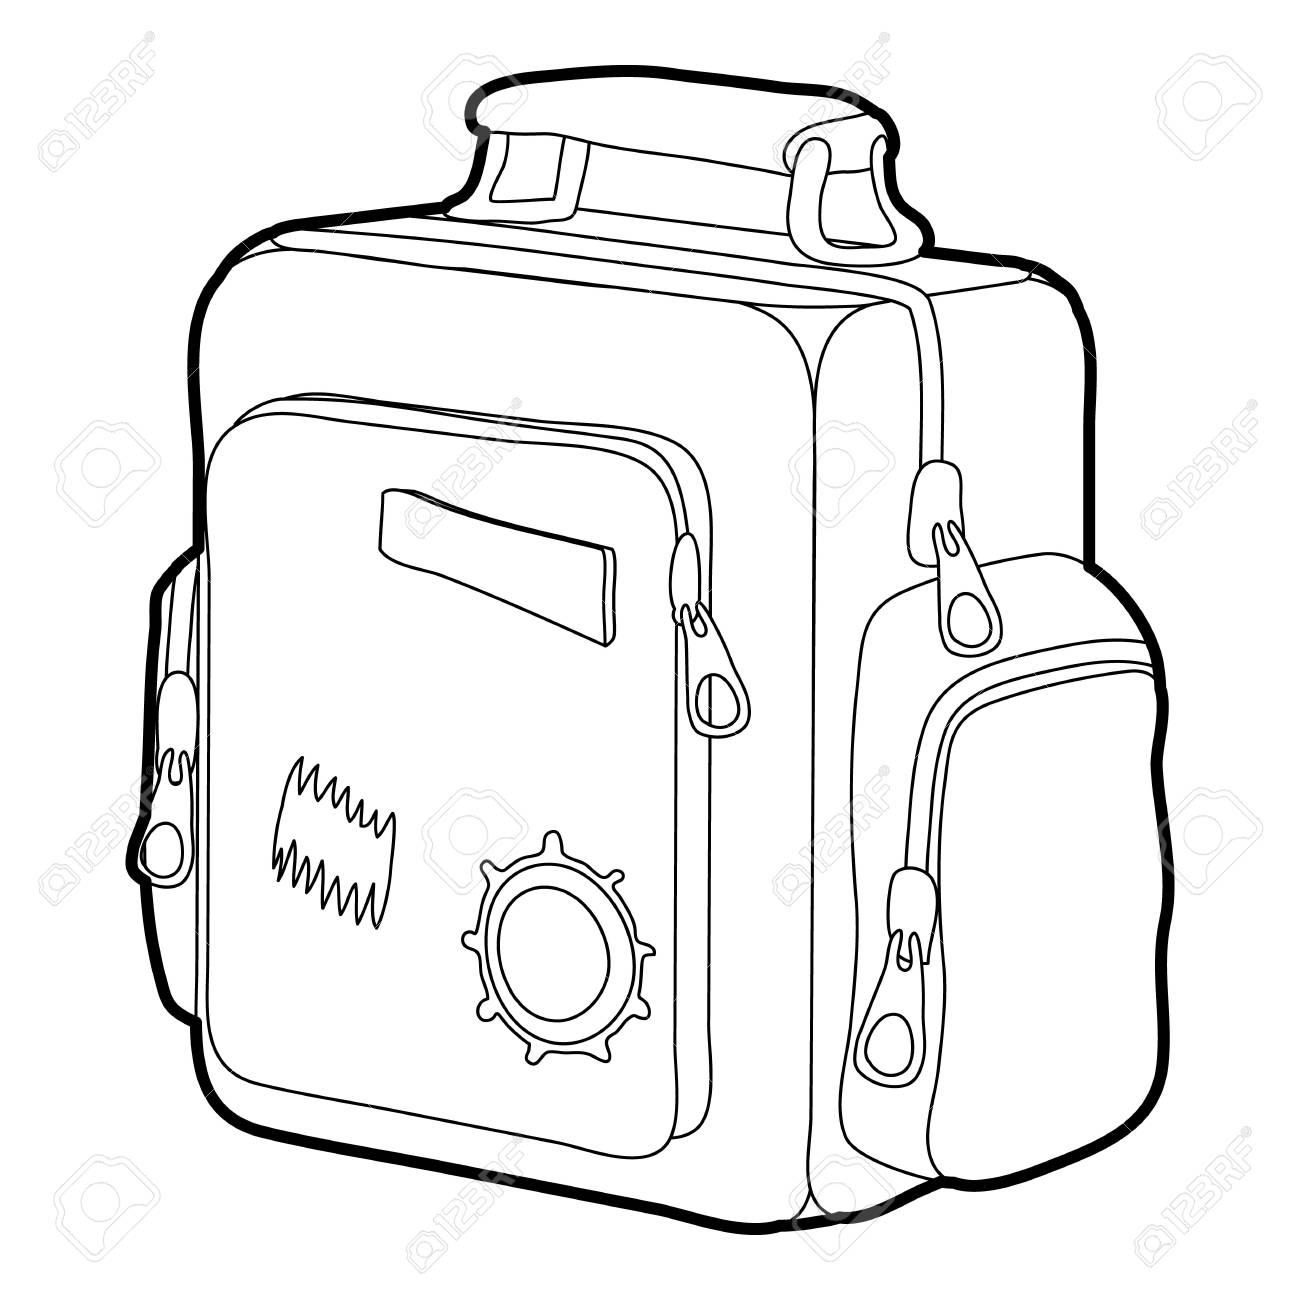 1300x1300 School Bag For Boys Icon Outline Royalty Free Cliparts, Vectors